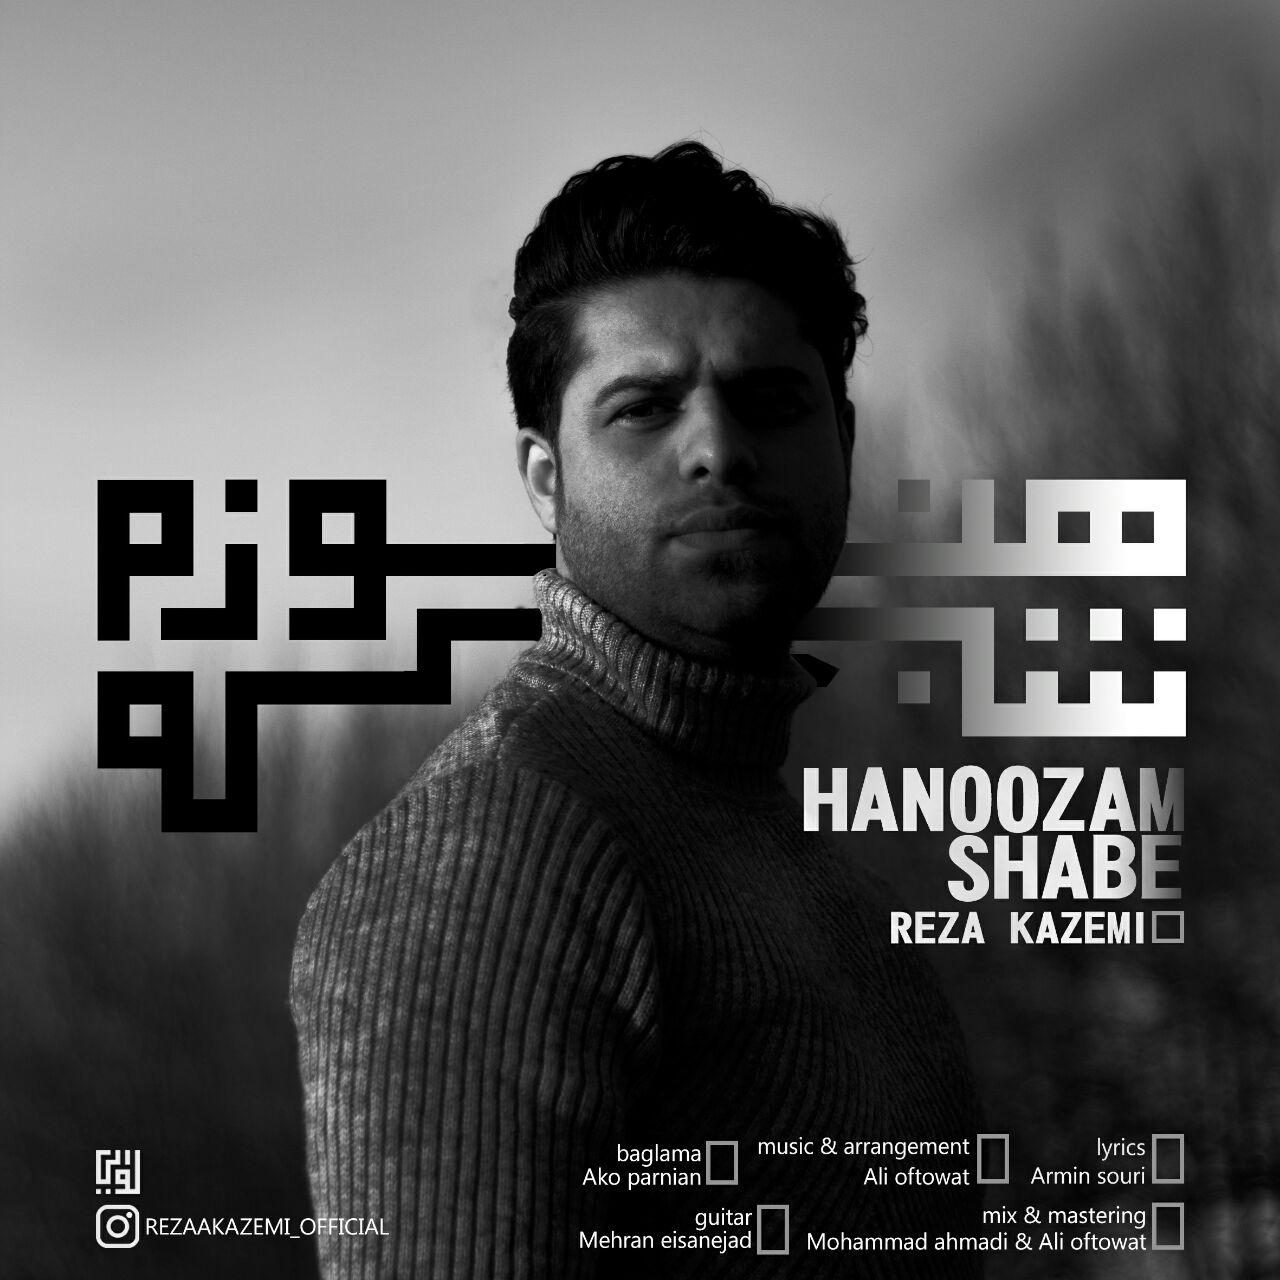 Reza Kazemi – Hanoozam Shabe